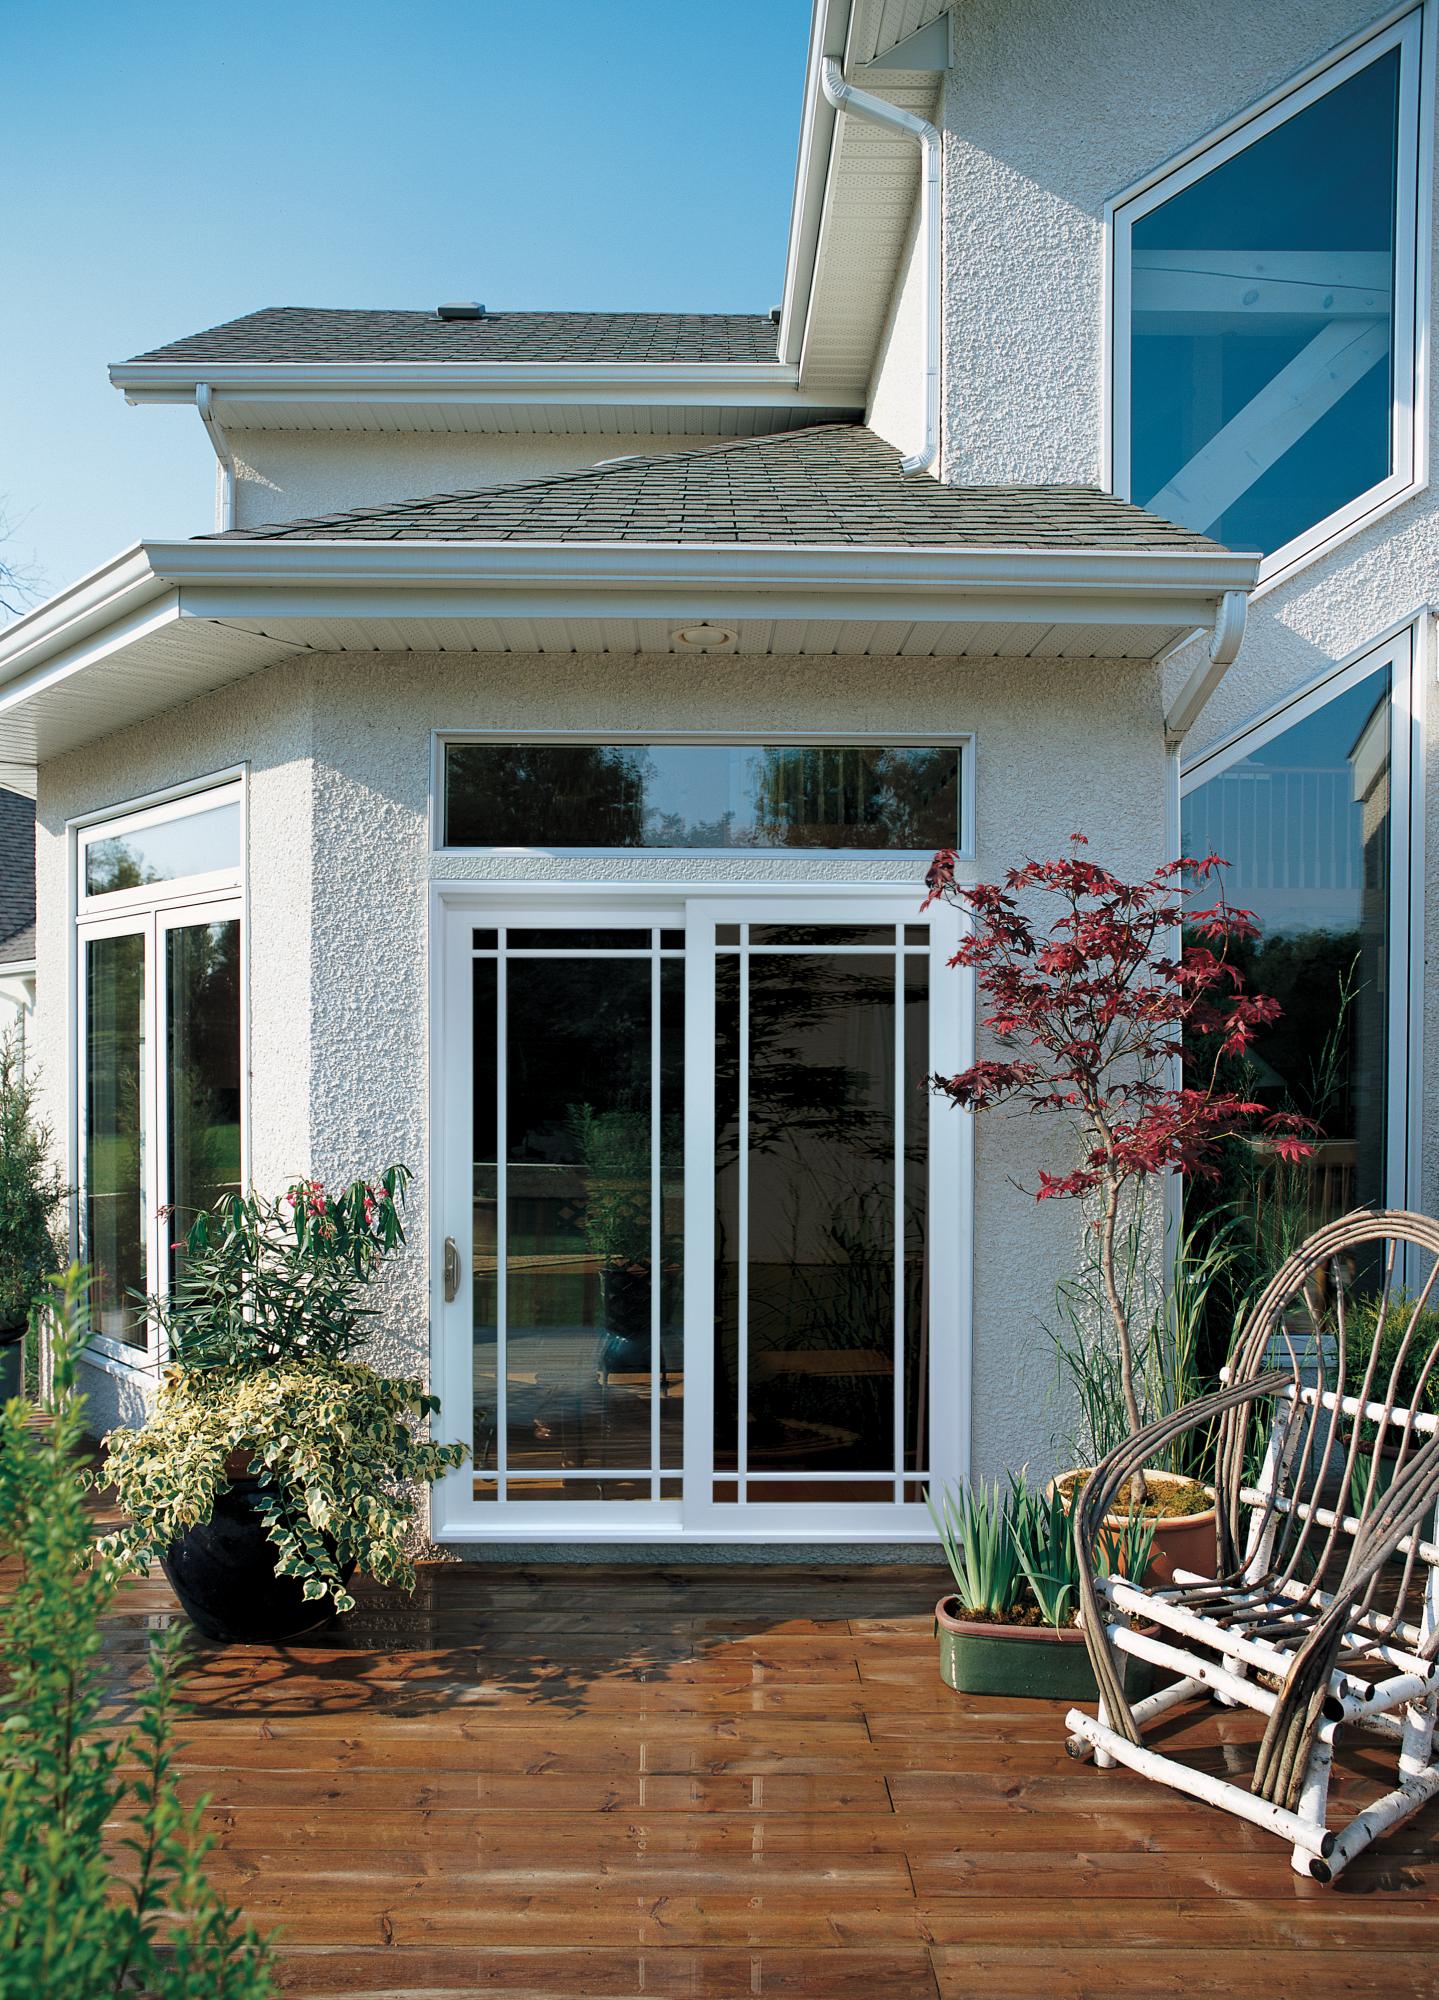 Premium Vinyl V 4500 Patio Doors 2 Panel Sliding Reliable And Energy Efficient Doors And Windows Jeld Wen Windows Doors